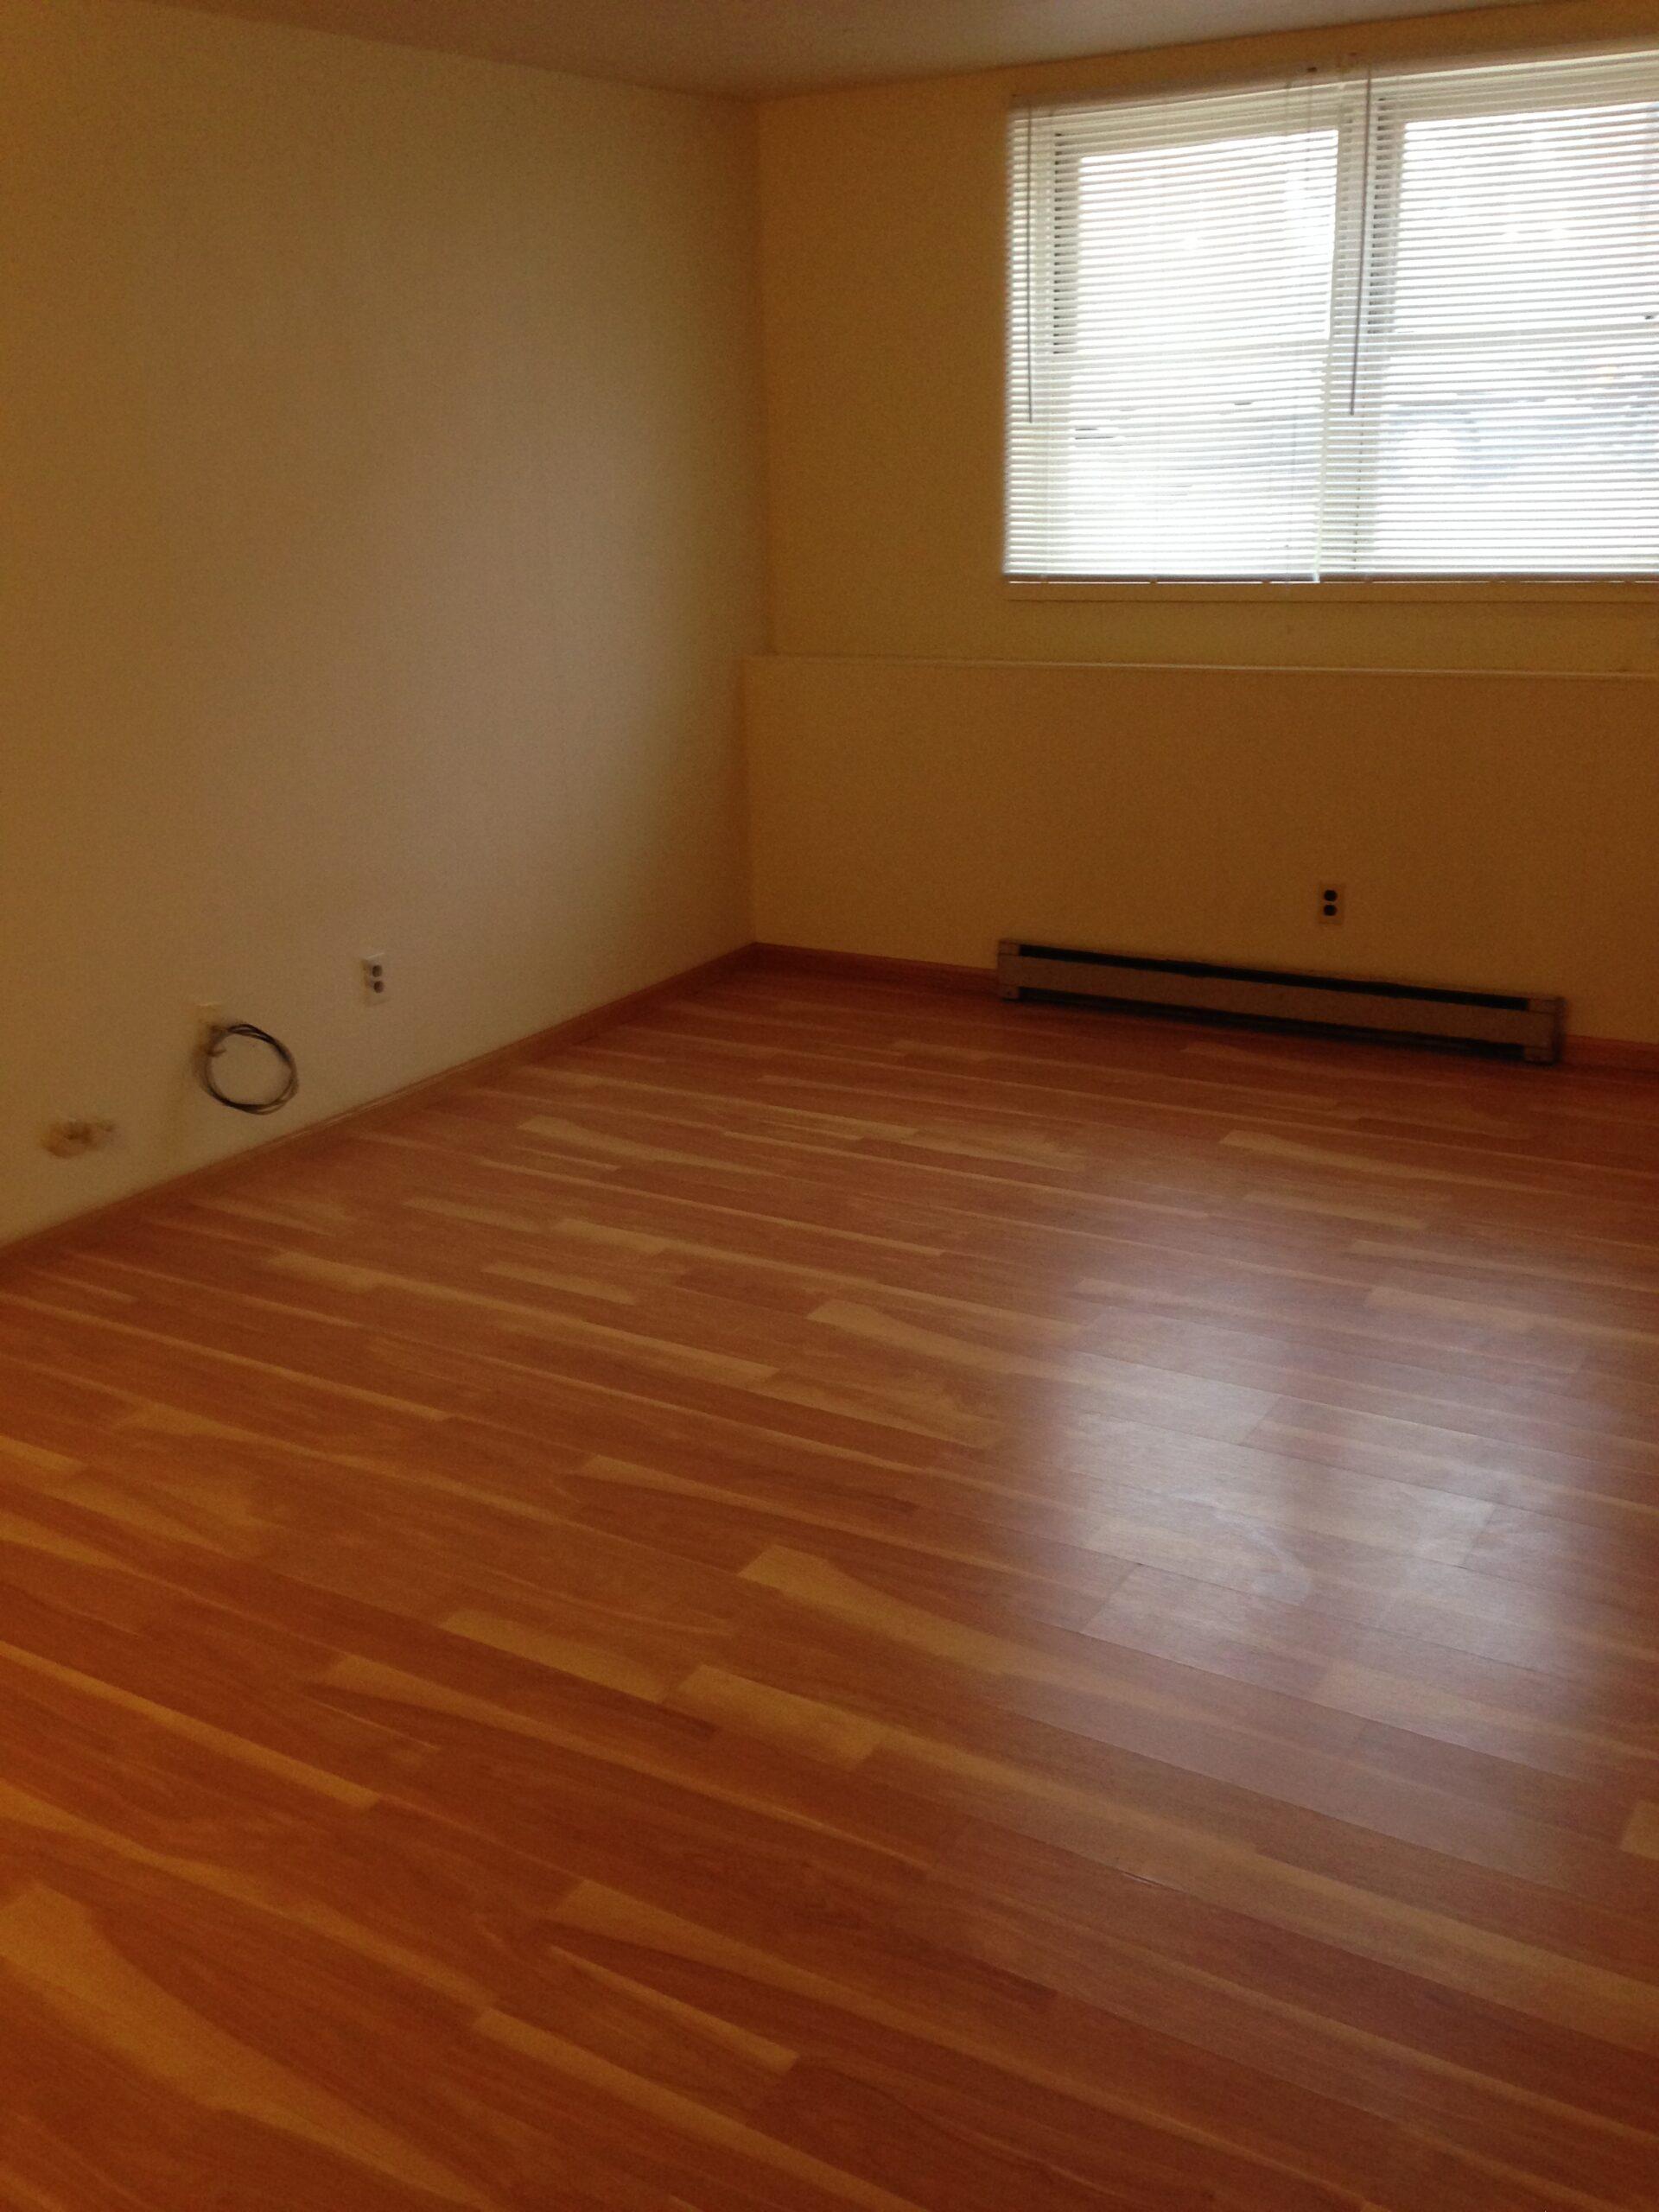 #6 Living Room